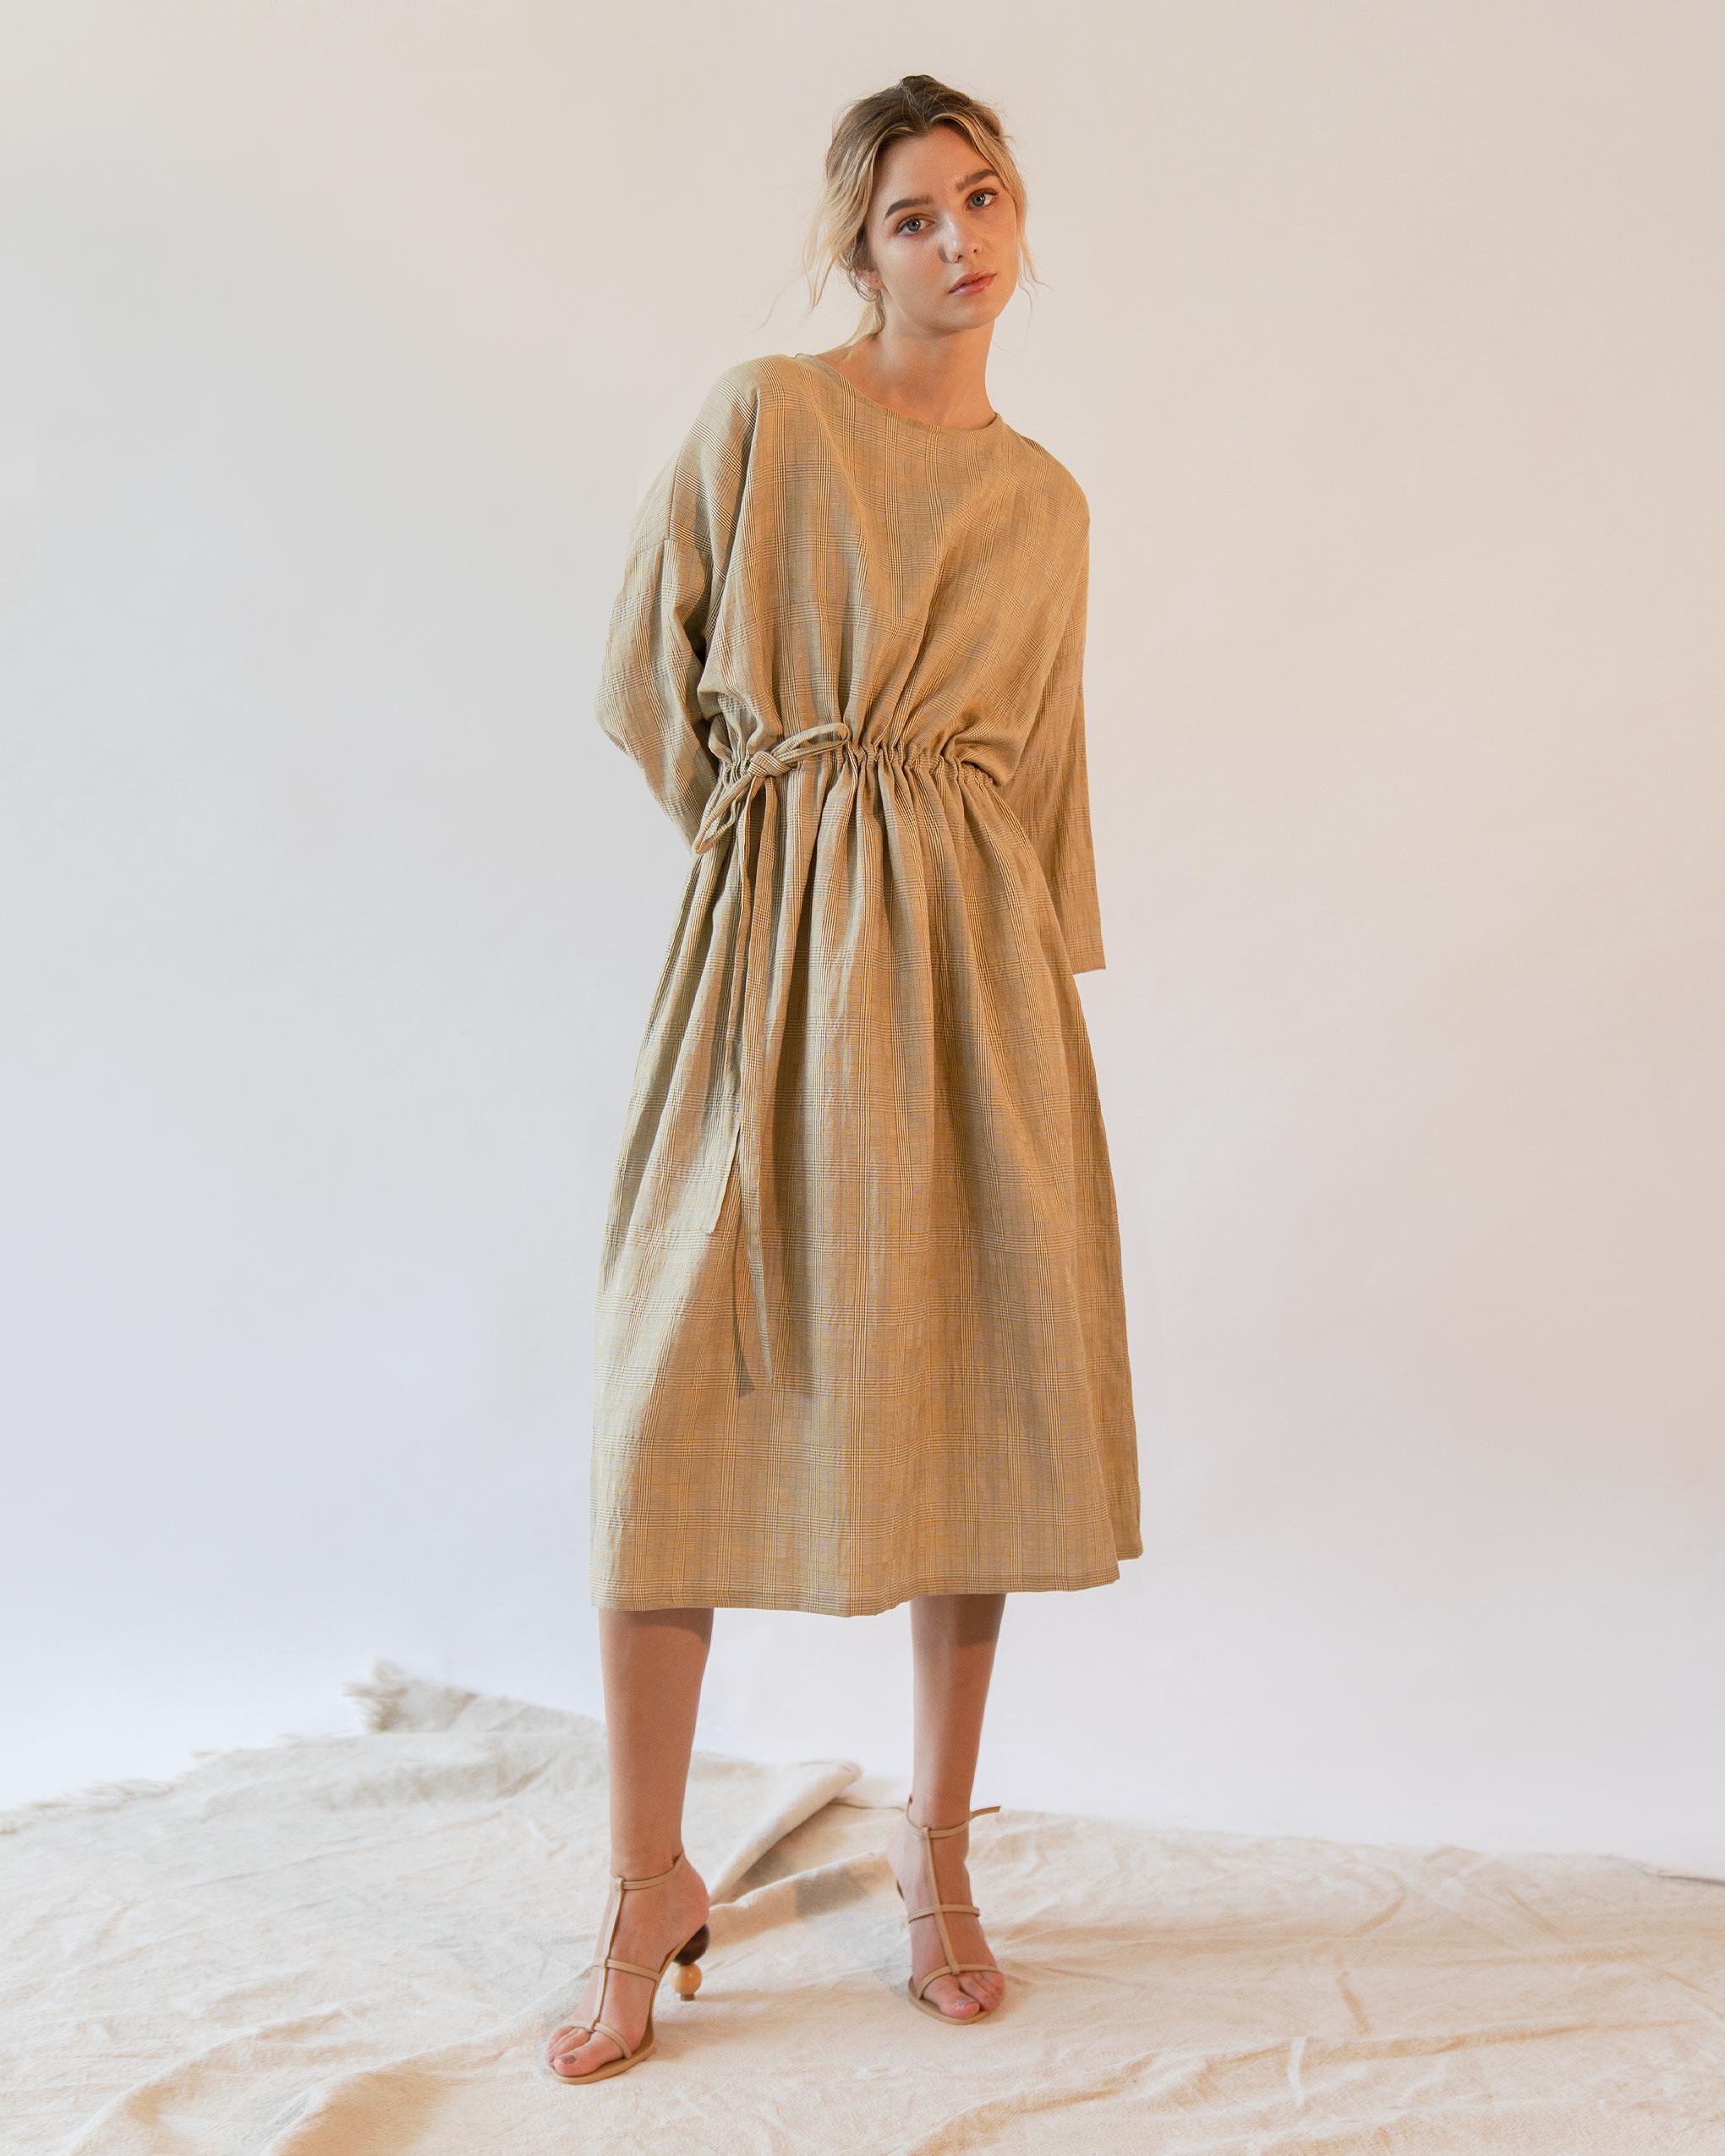 A woman is wearing yellow check pattern gathered long sleeve dress.